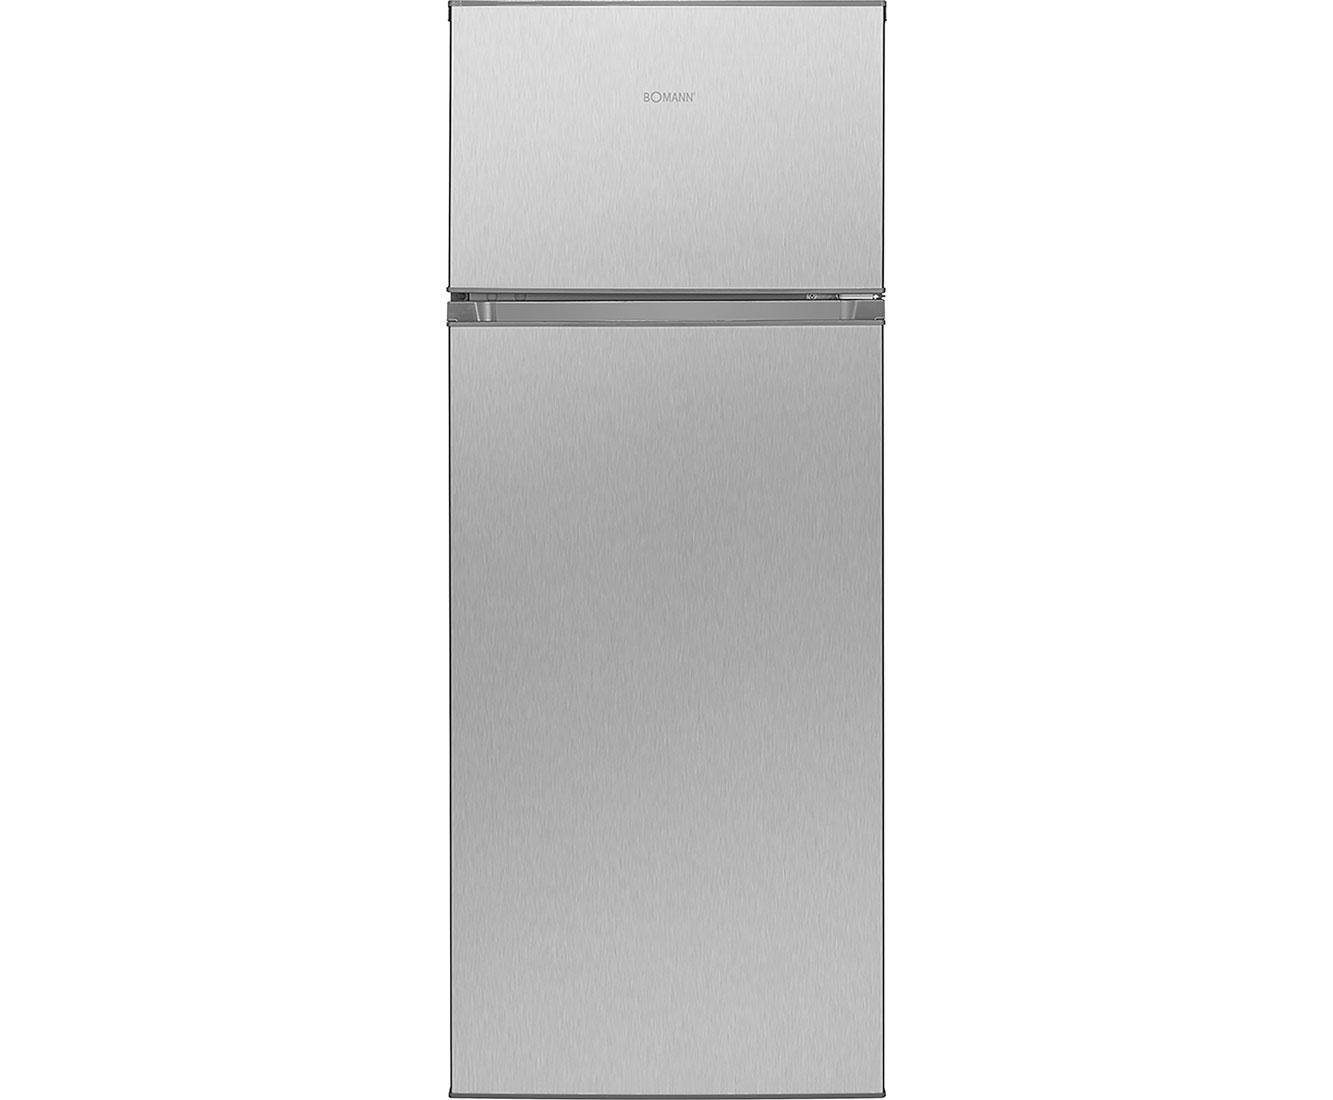 Bomann DT 7311 Kühlschränke - Edelstahl-Optik